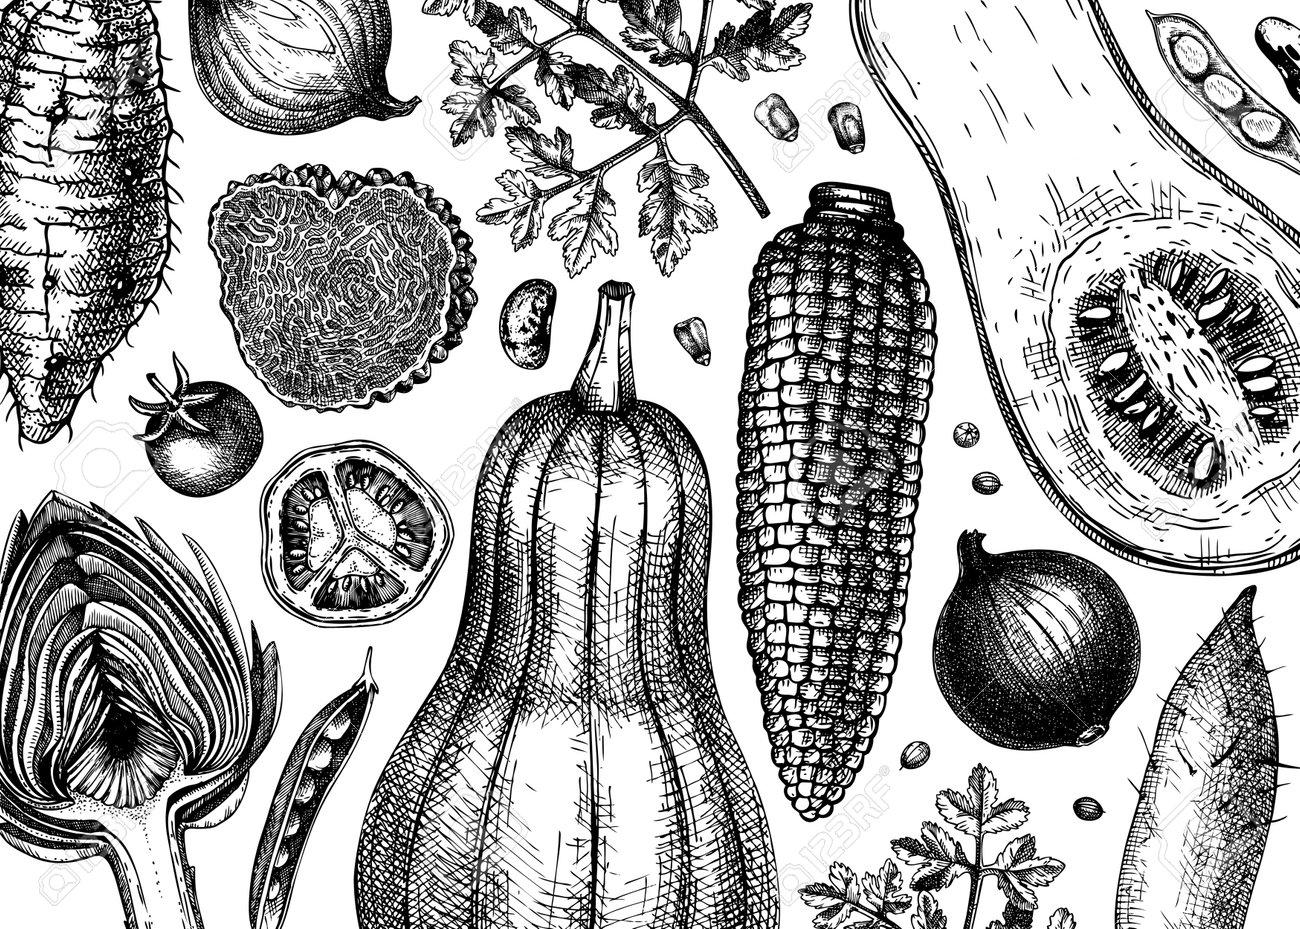 Hand-sketched vegetables vector background. Healthy food ingredients banner template. Vintage vegetables, herbs, mushrooms illustrations for menu, web banner, recipes, branding. - 170065541